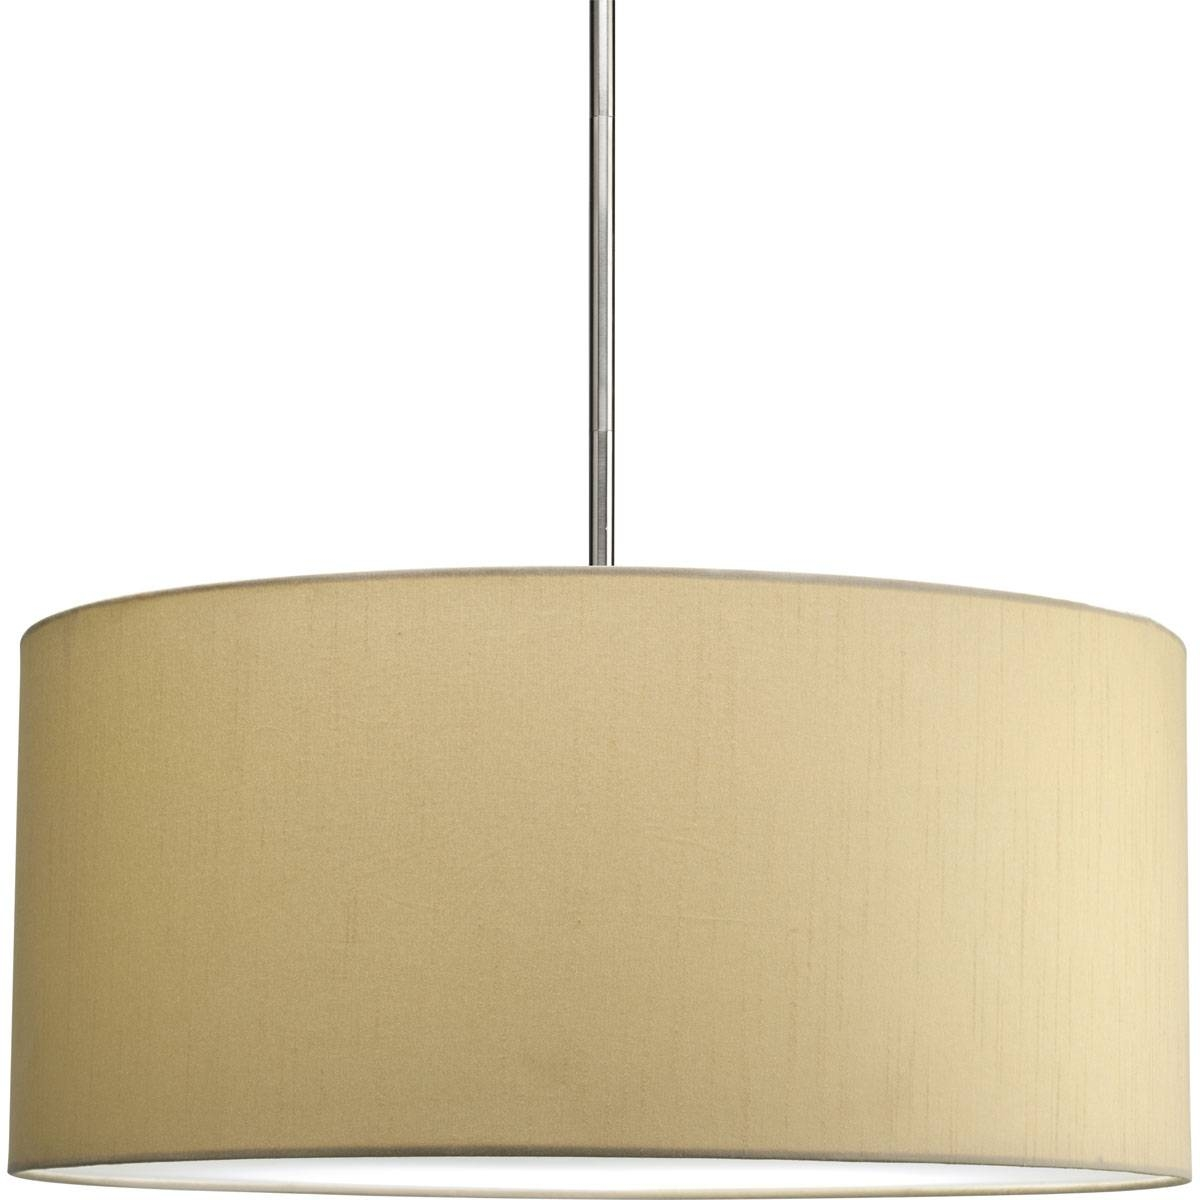 Luxury Drum Pendant Lighting 22 For Your Capiz Shell Pendant Light inside Shell Light Shades Pendants (Image 8 of 15)